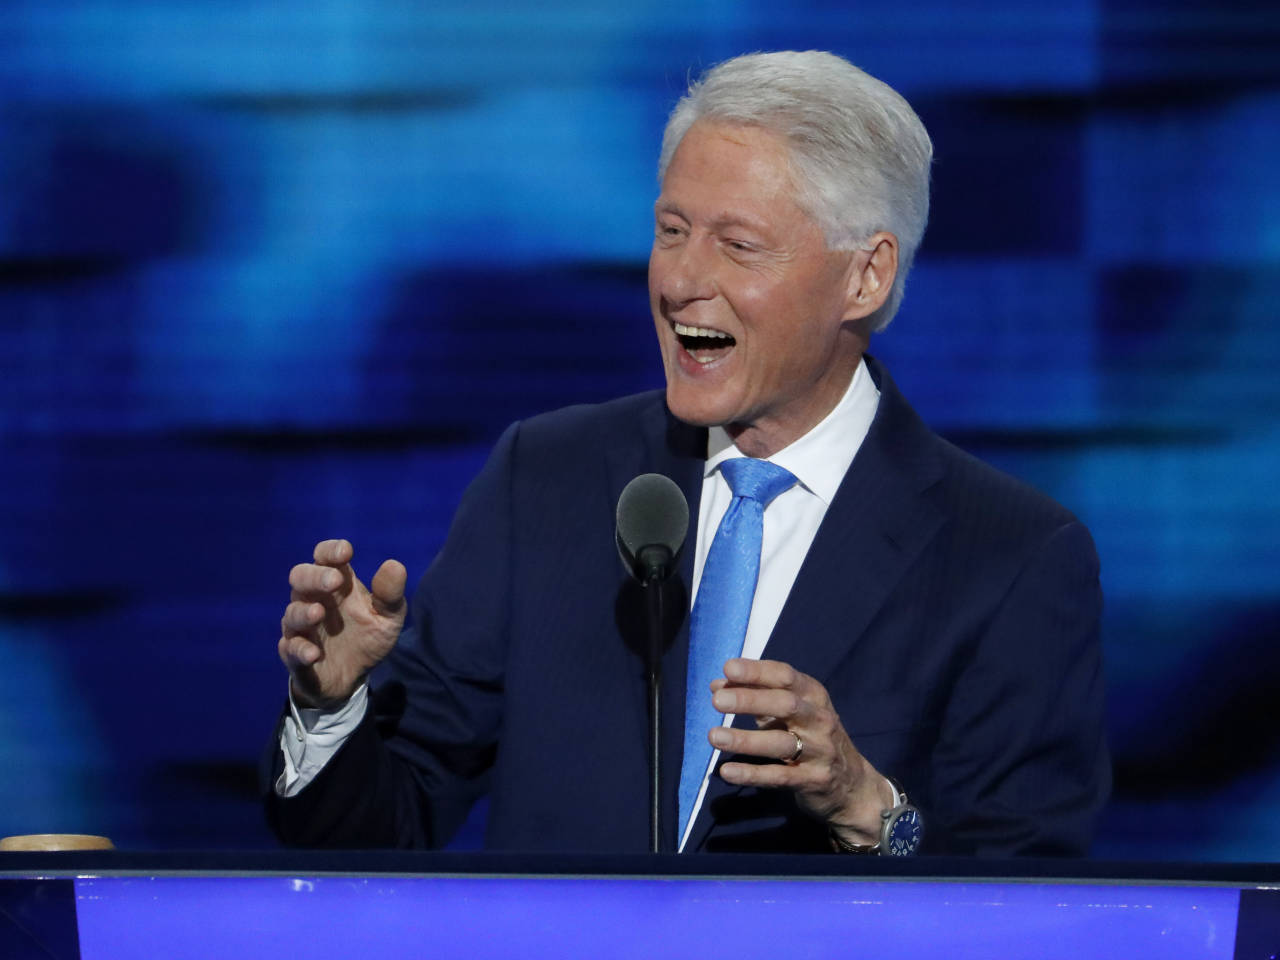 Bill clinton speech writers